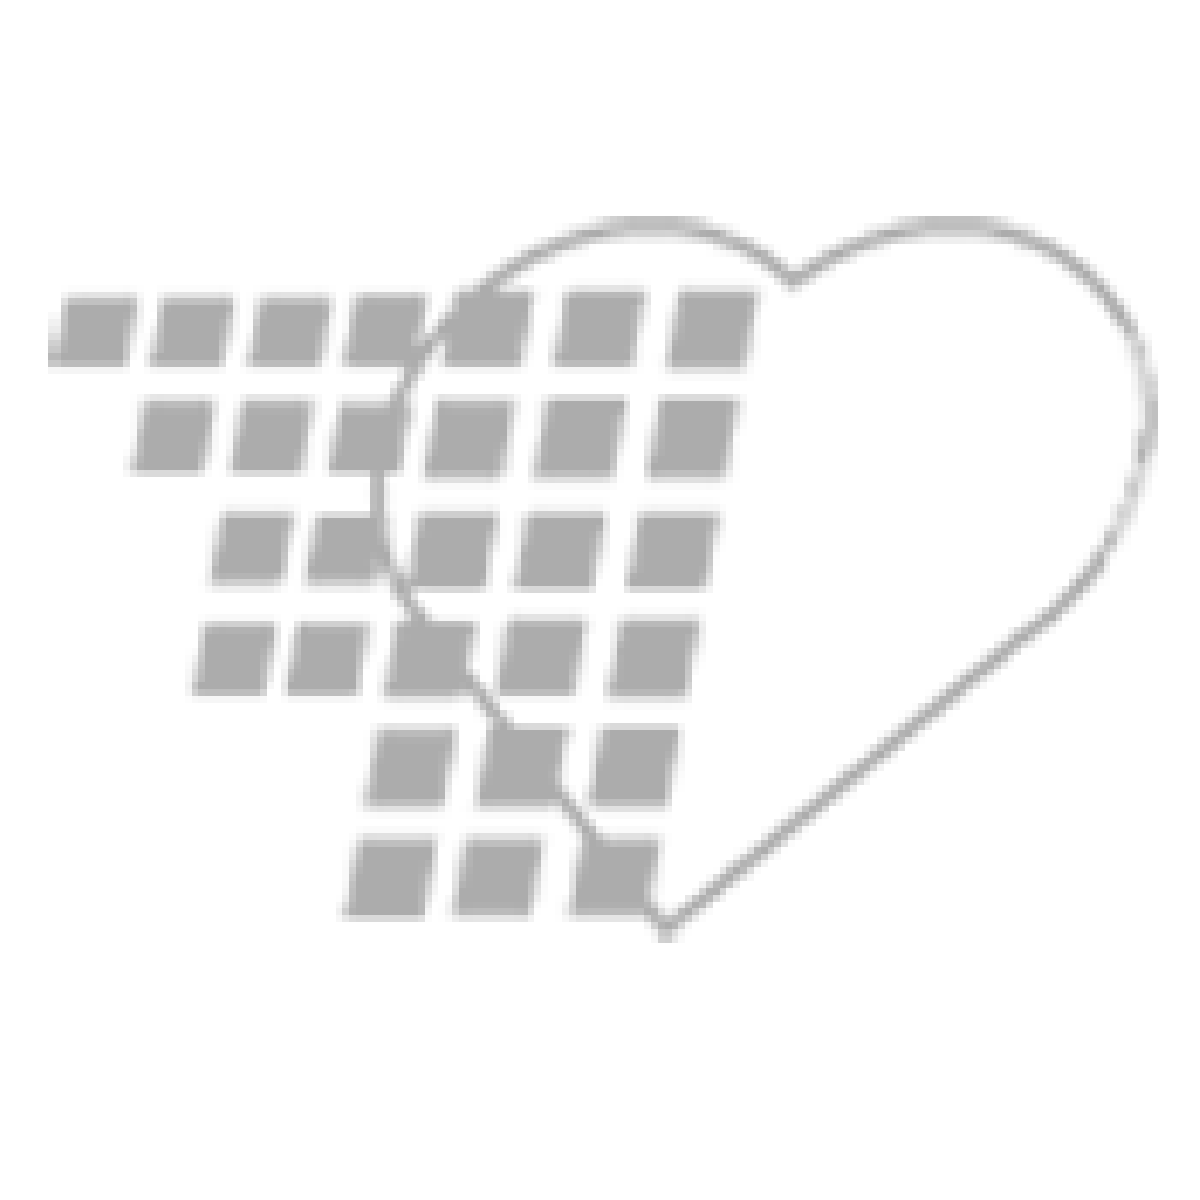 06-93-6919 - Demo Dose® Dobutrx DOBUTamin 250mg/20mL 20mL